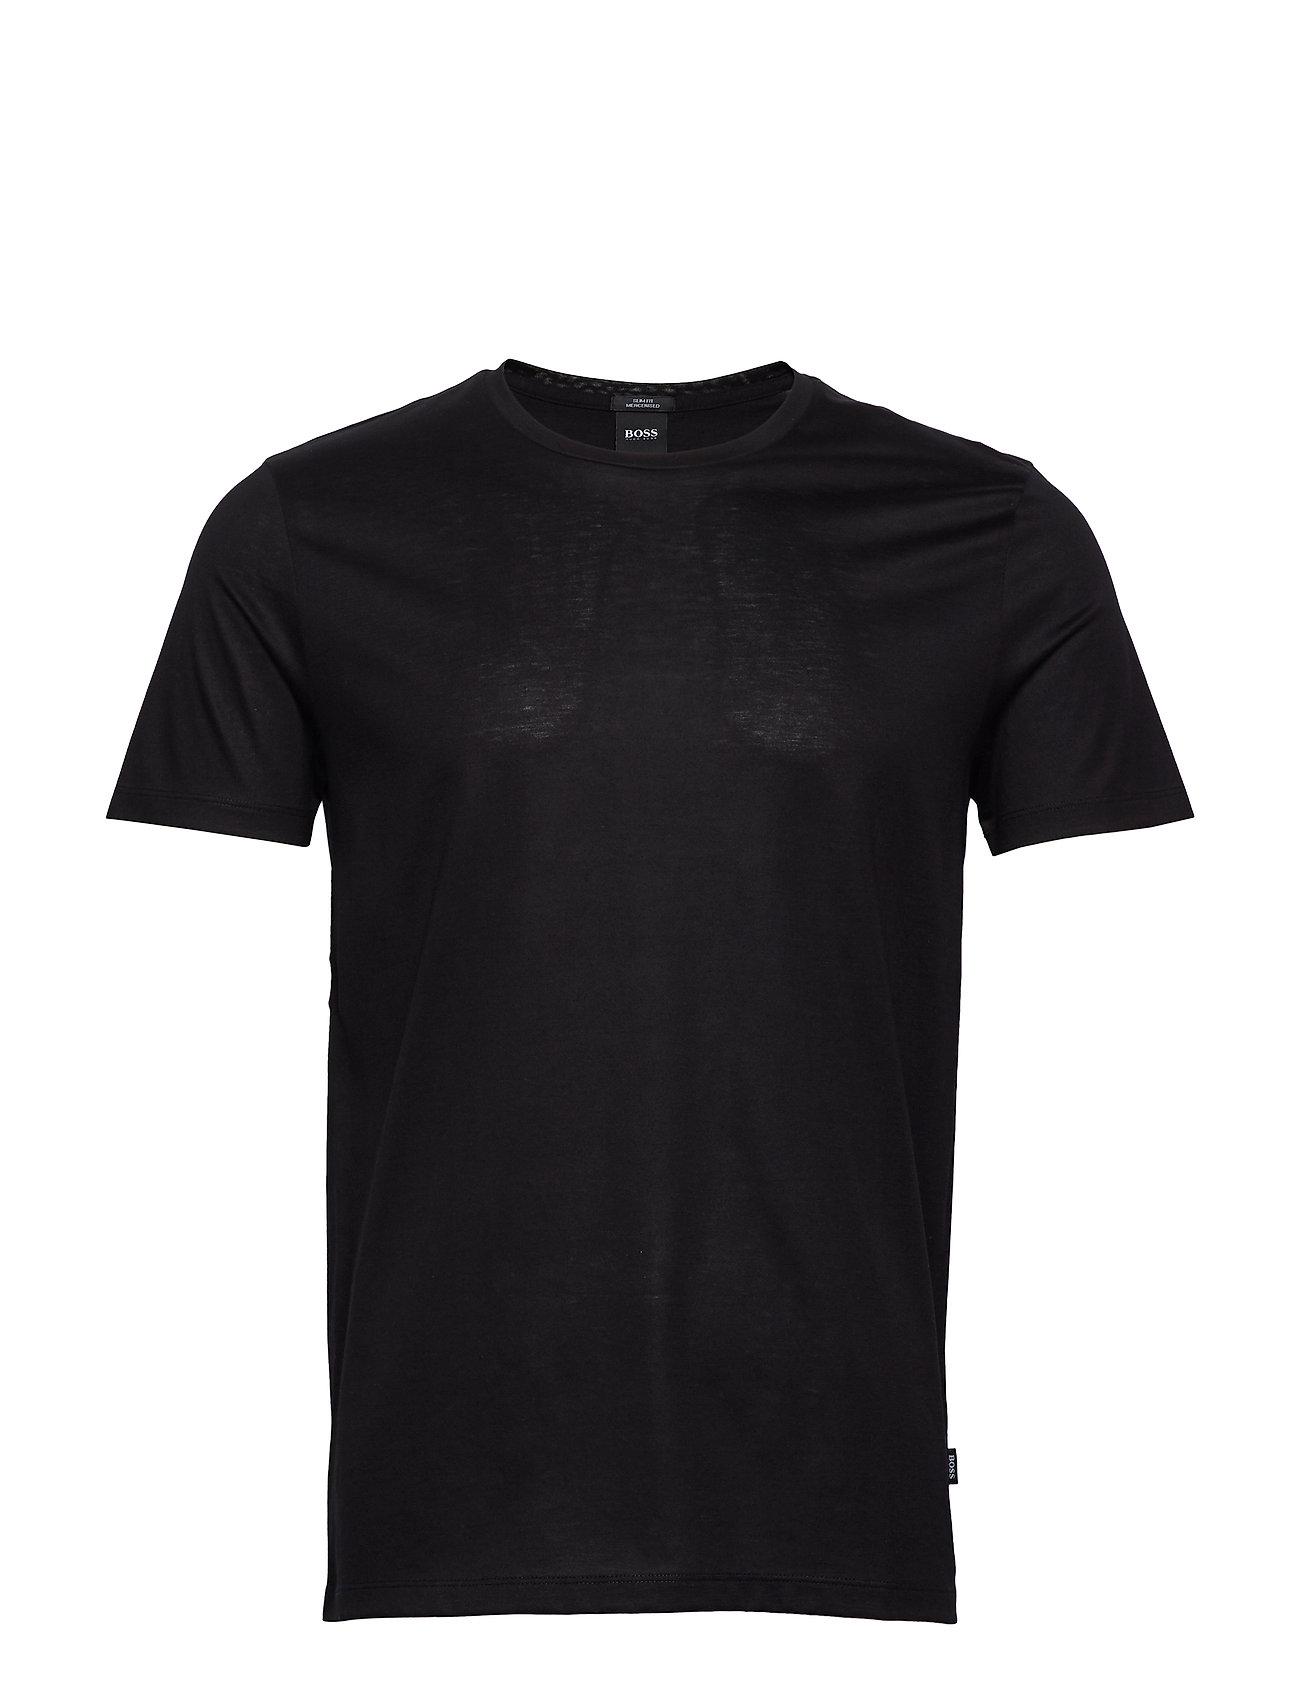 BOSS Business Wear Tessler 100 - BLACK